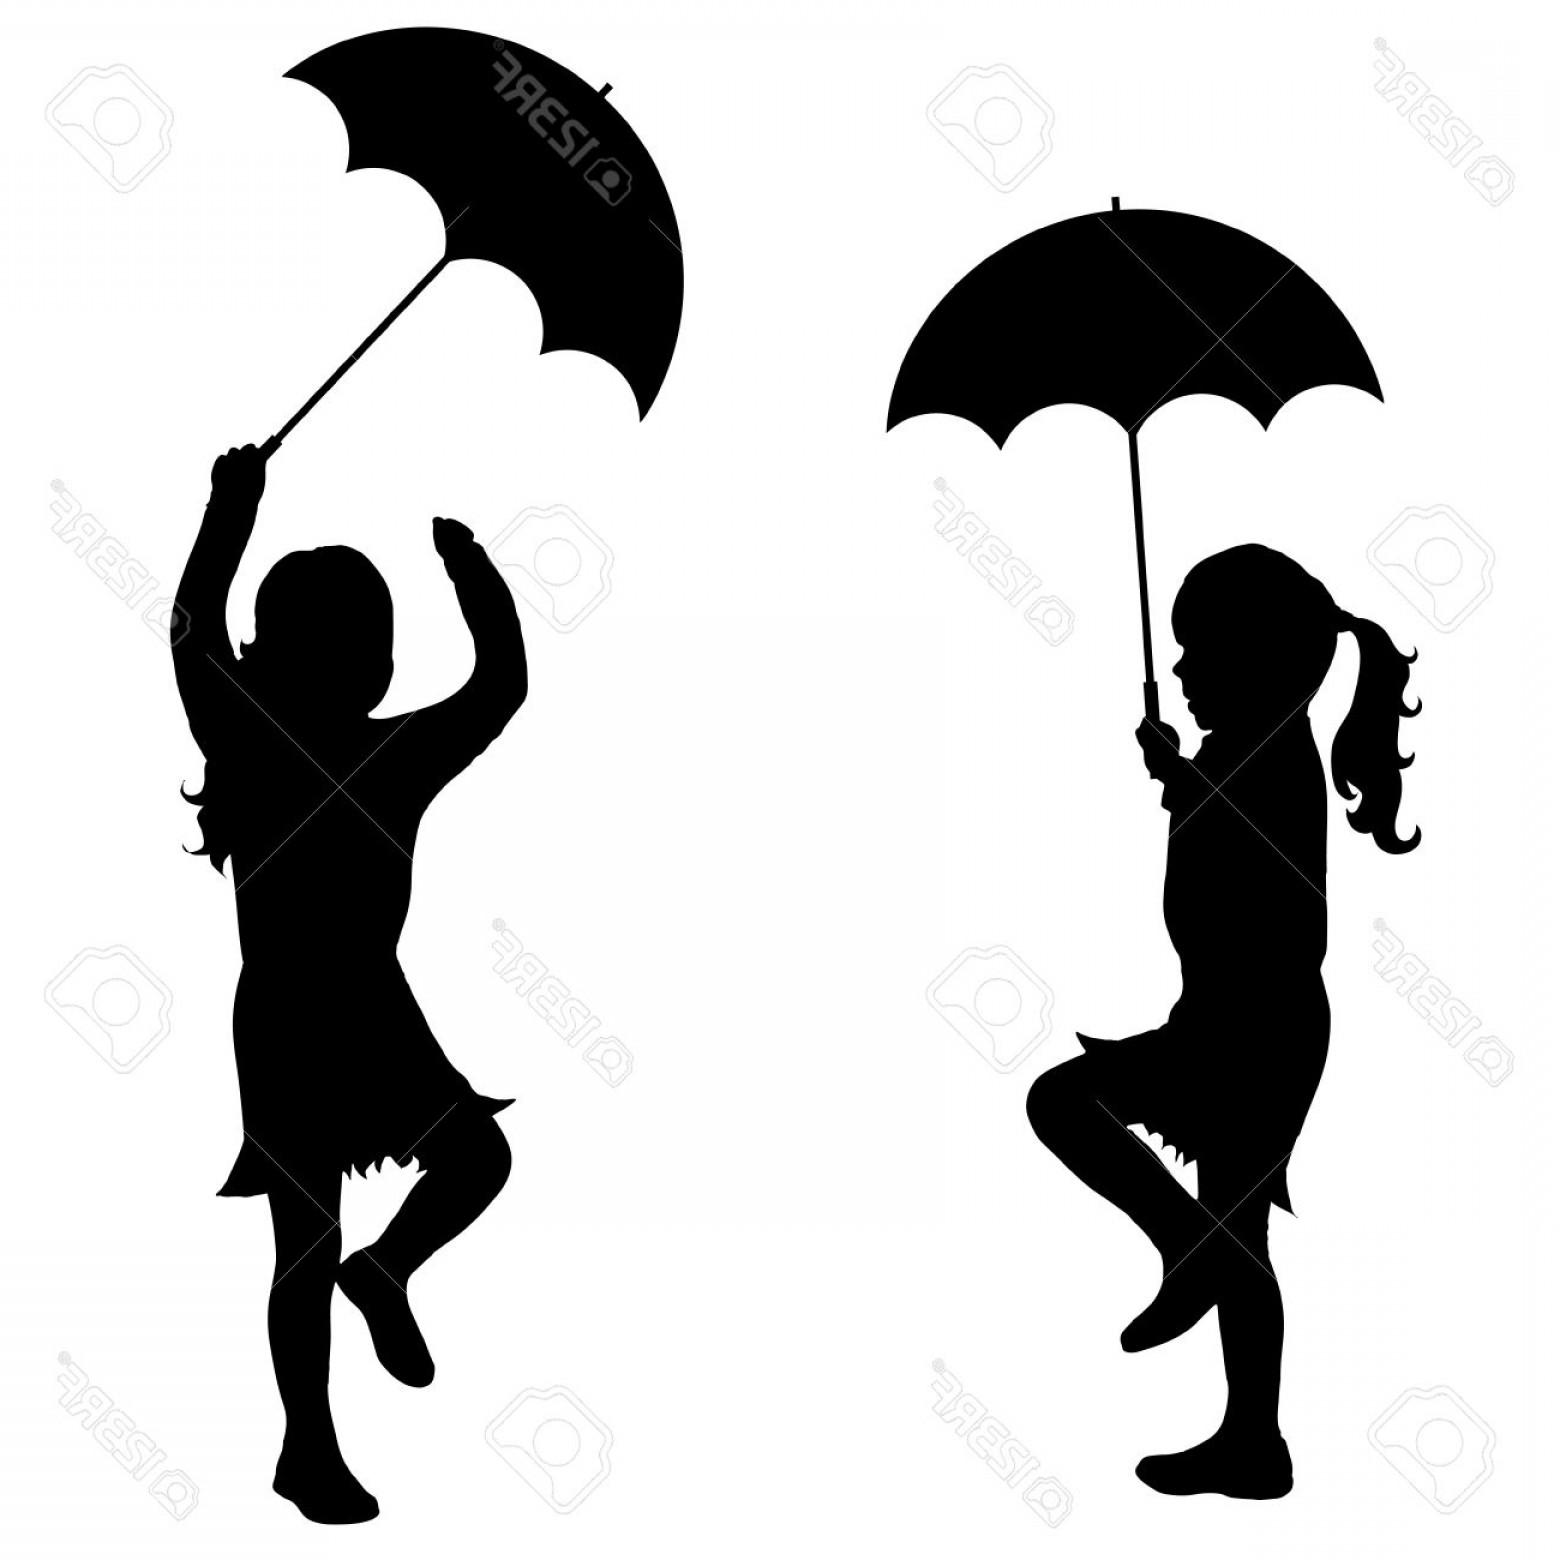 1560x1560 Photostock Vector Black Vector Silhouette Of Girl With Umbrella